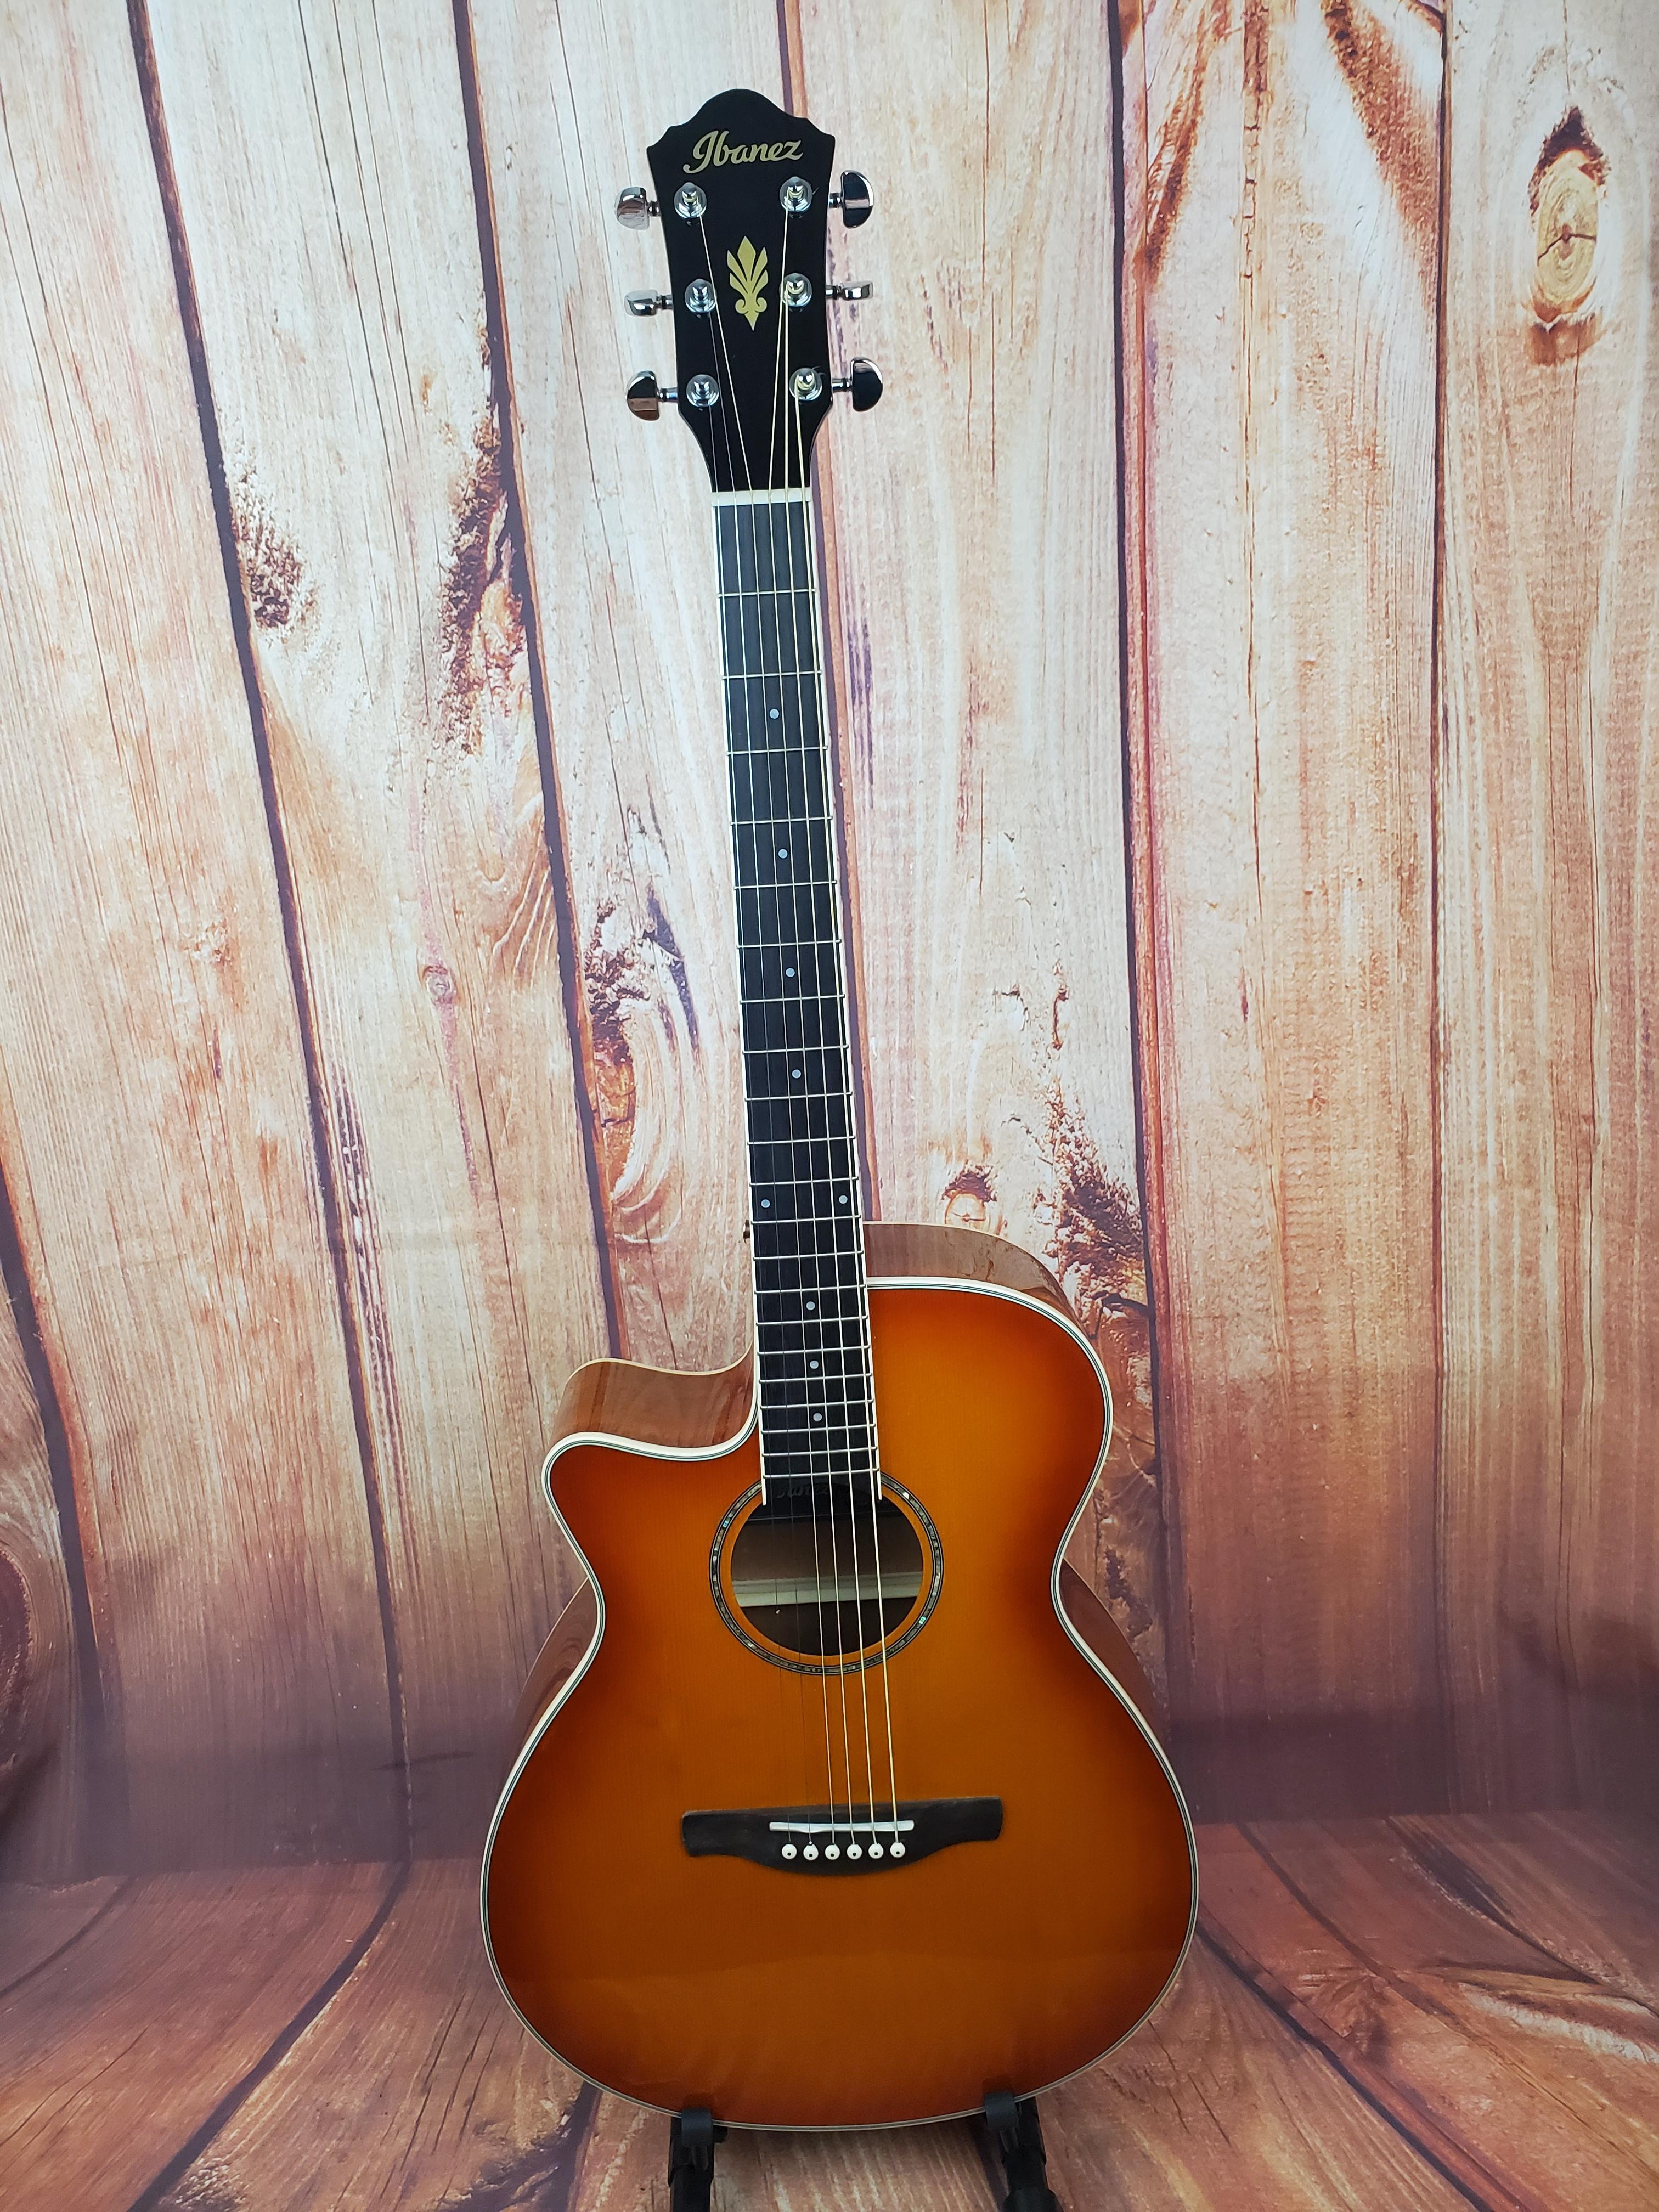 Used- Ibanez AEG18LIVV Left-Handed Acoustic